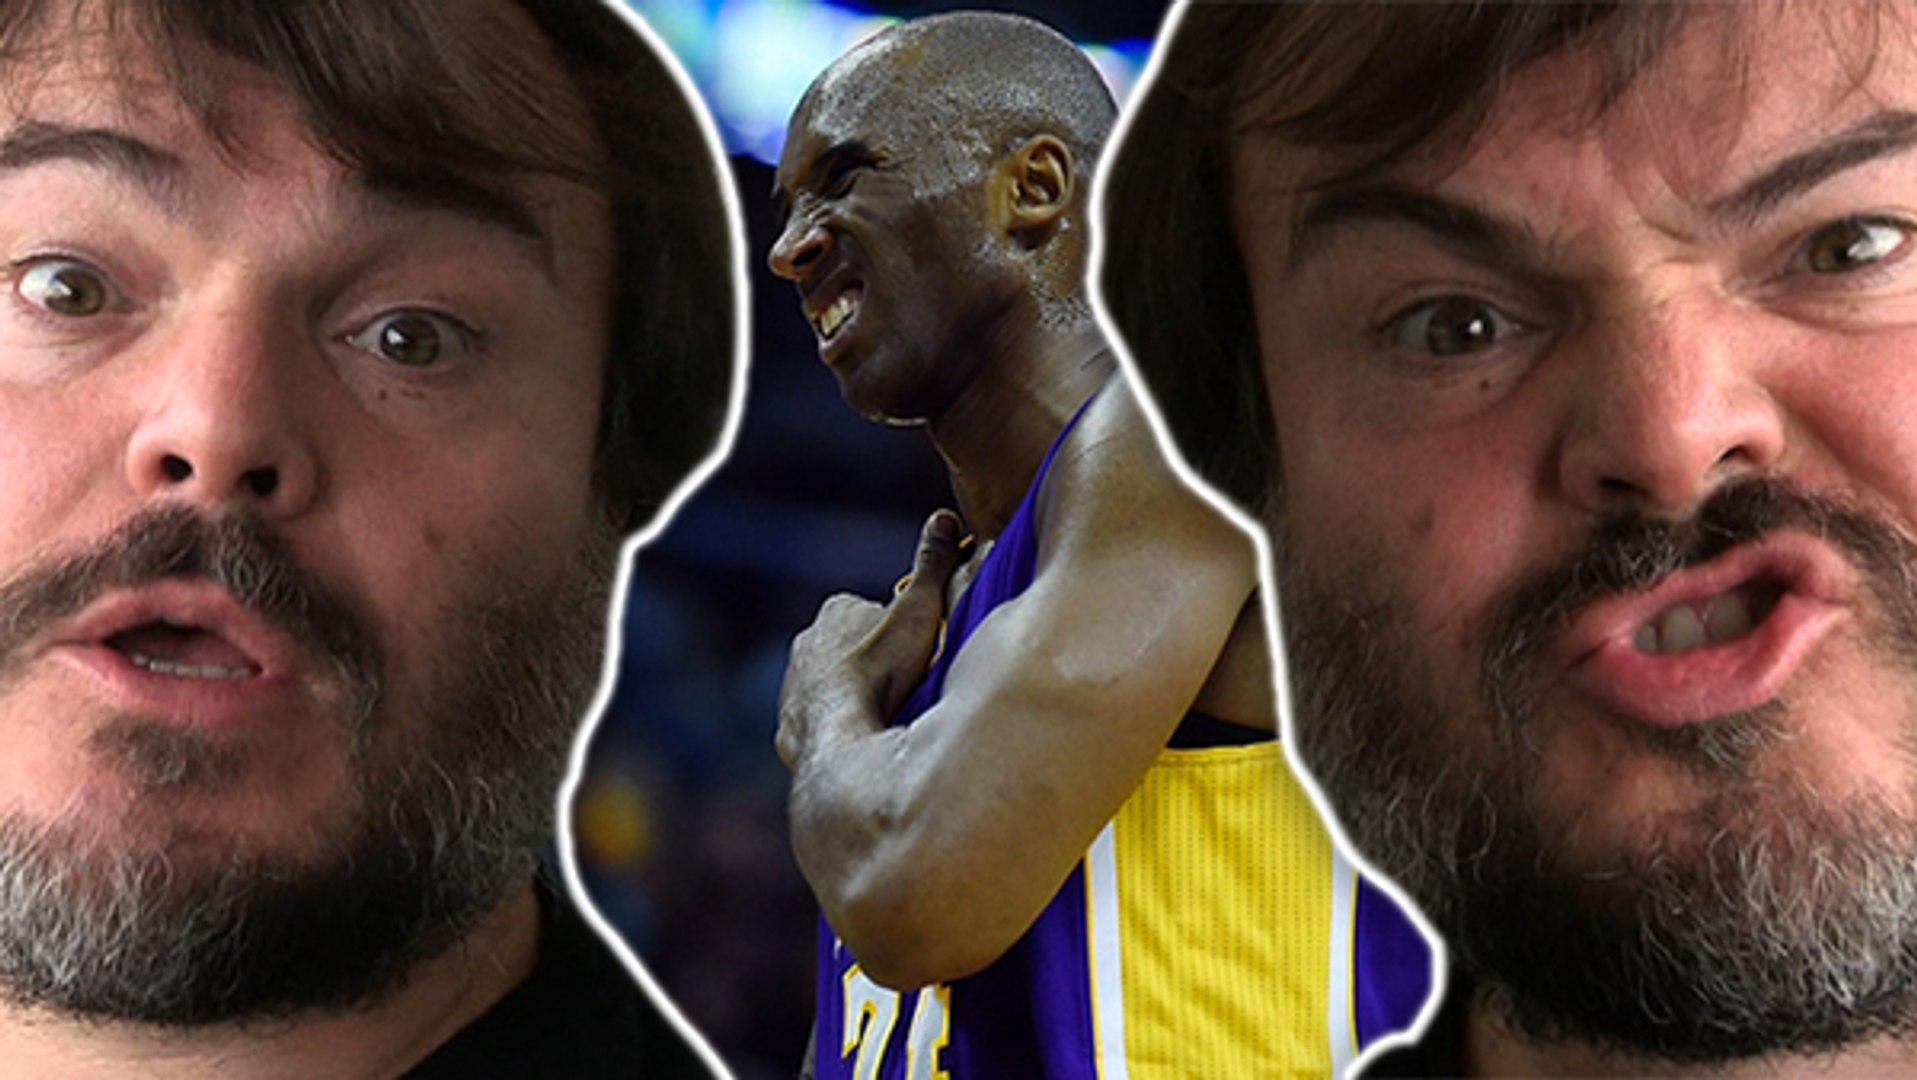 Jack Black Flips Out Over Kobe Bryant's Injury